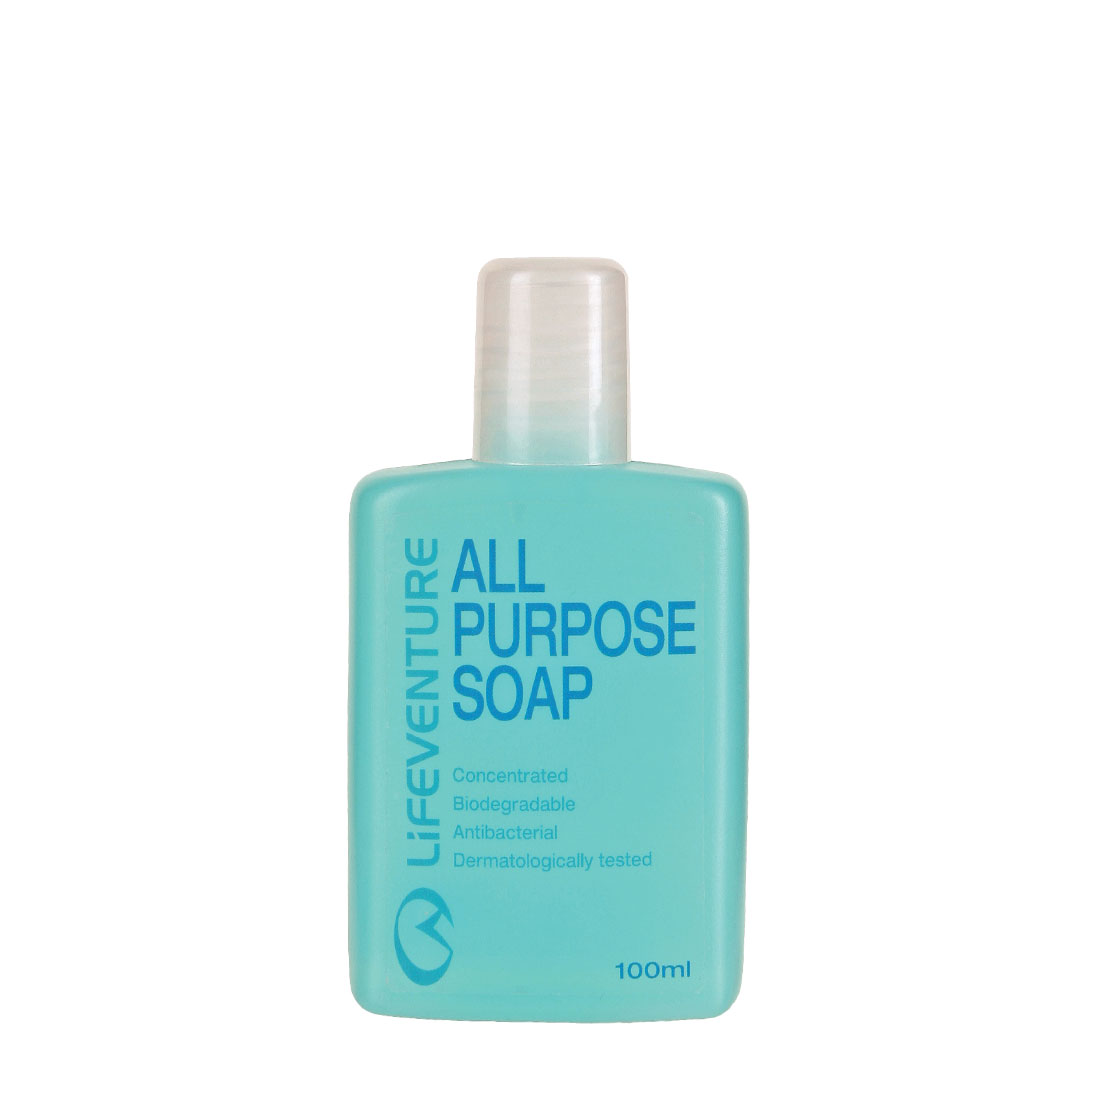 62060-soap-100ml-1